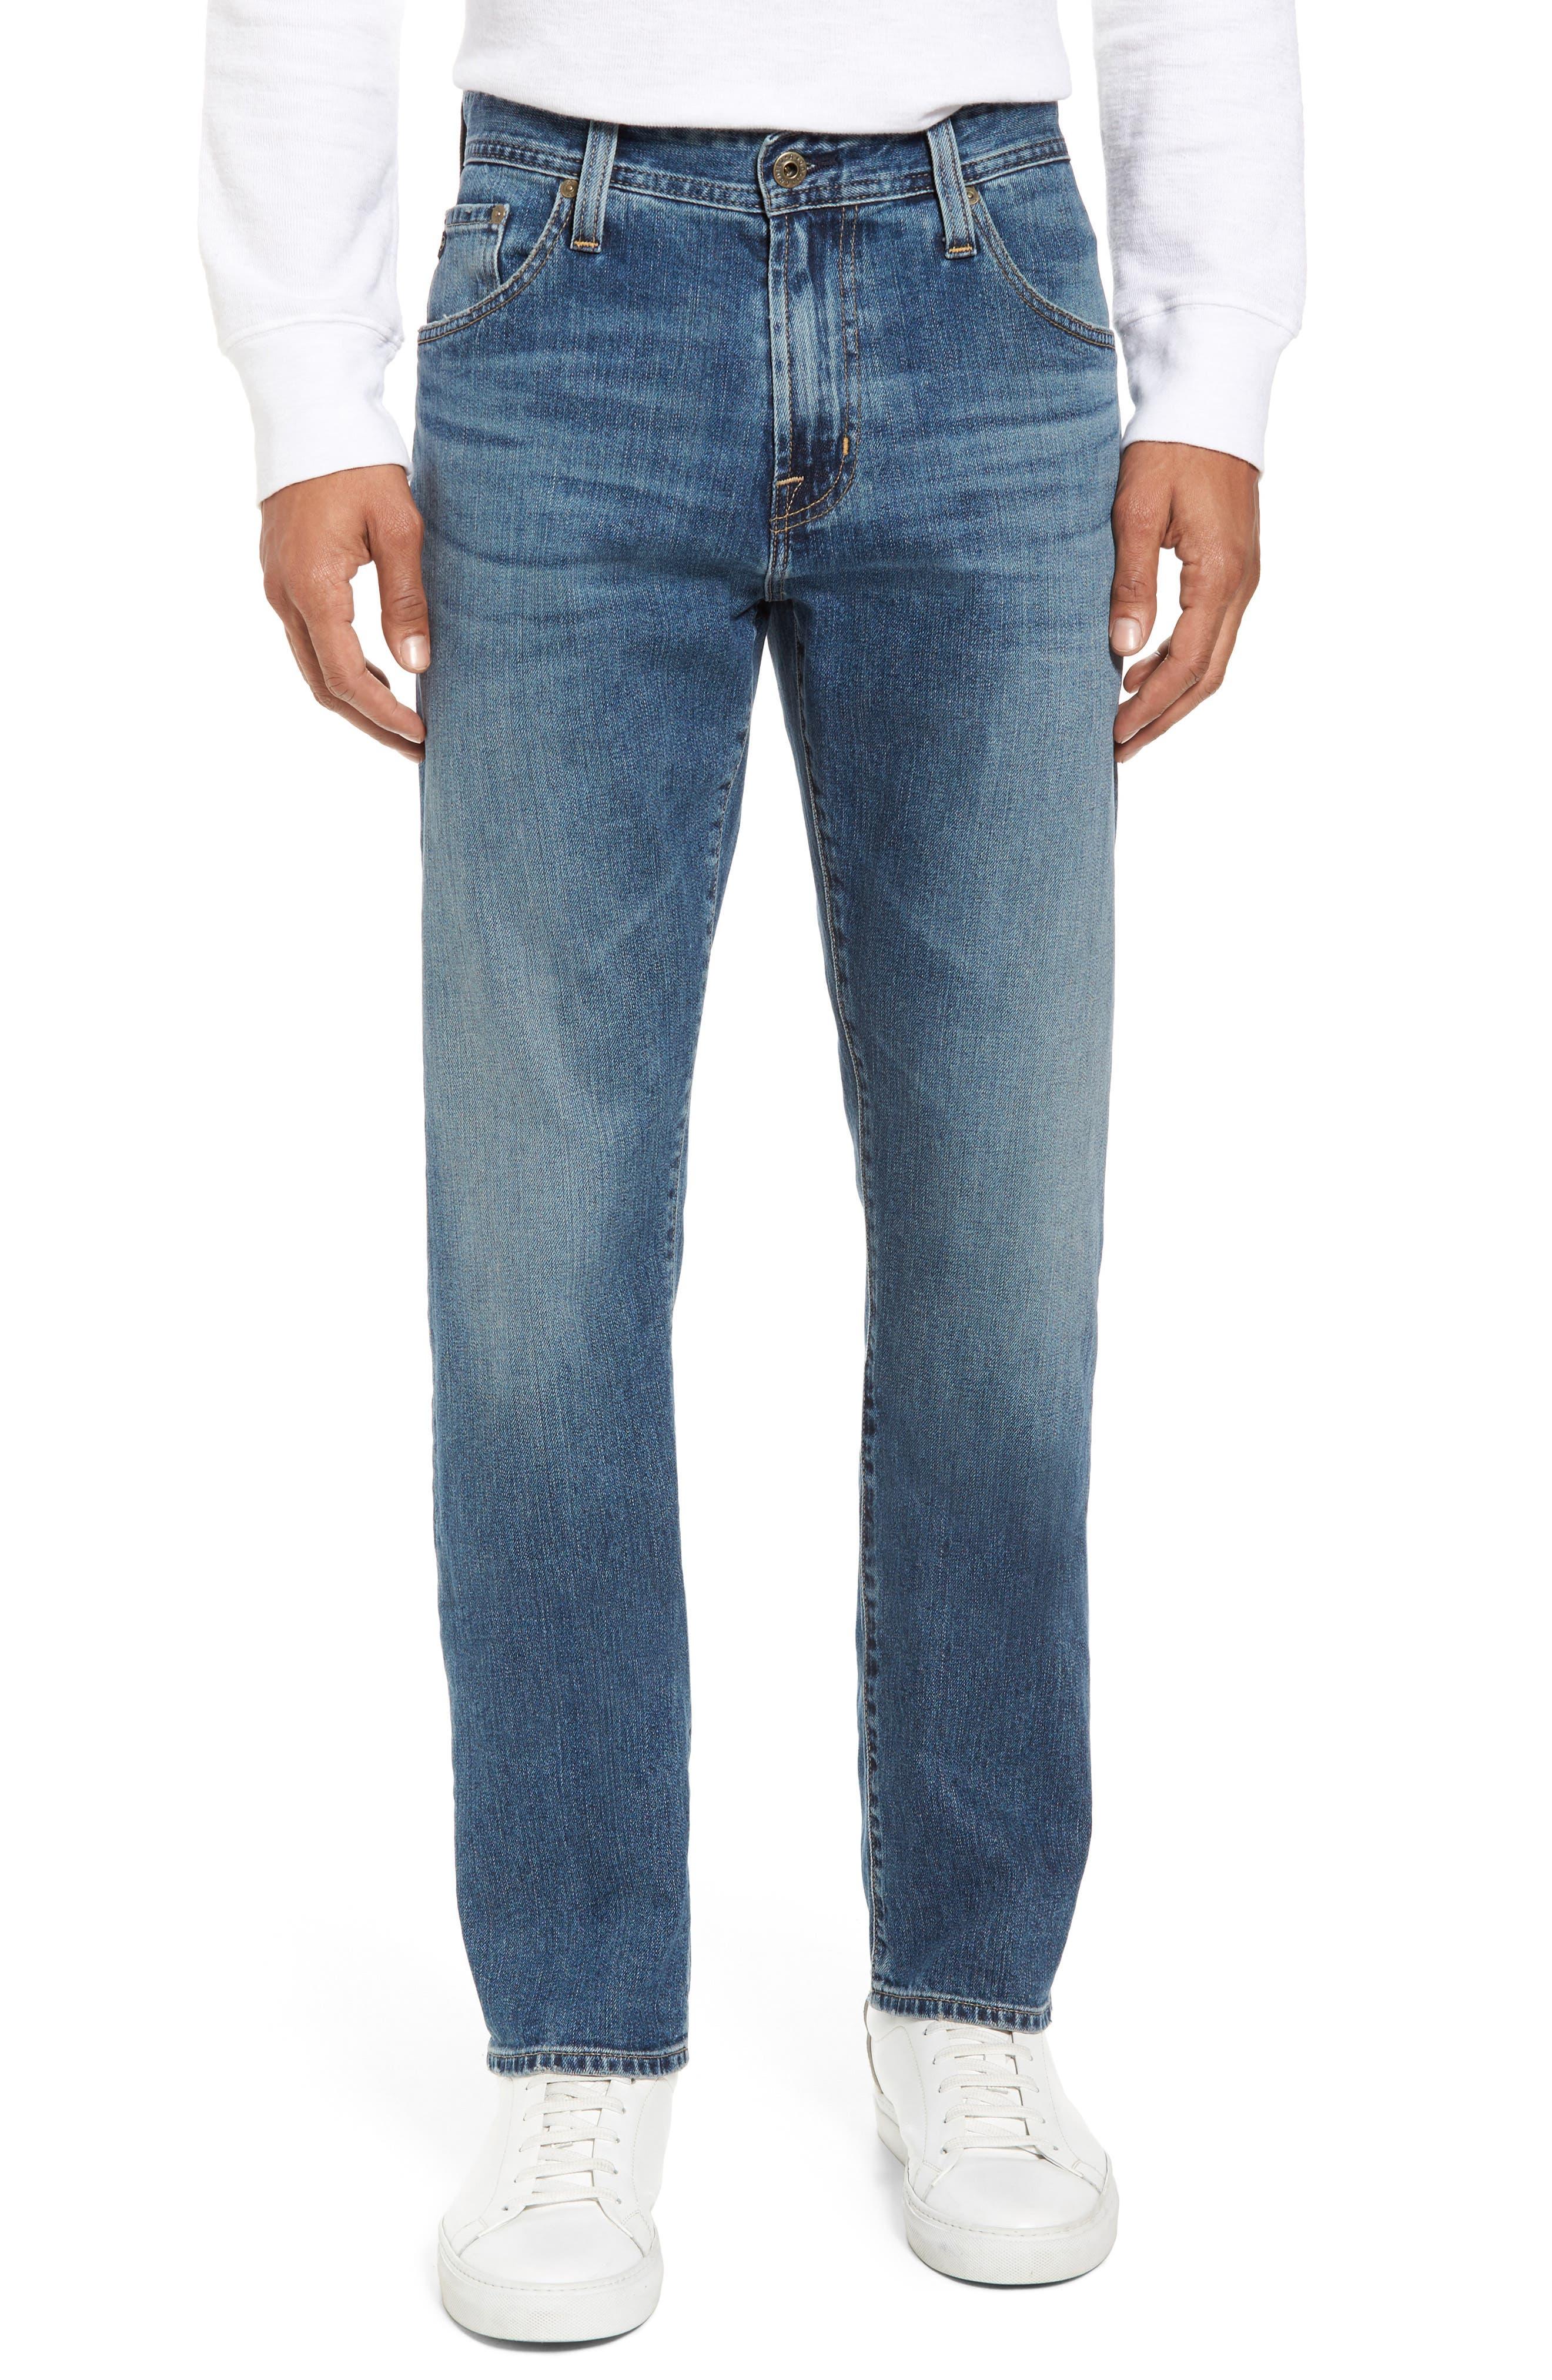 Ives Straight Fit Jeans,                         Main,                         color, Grasslands